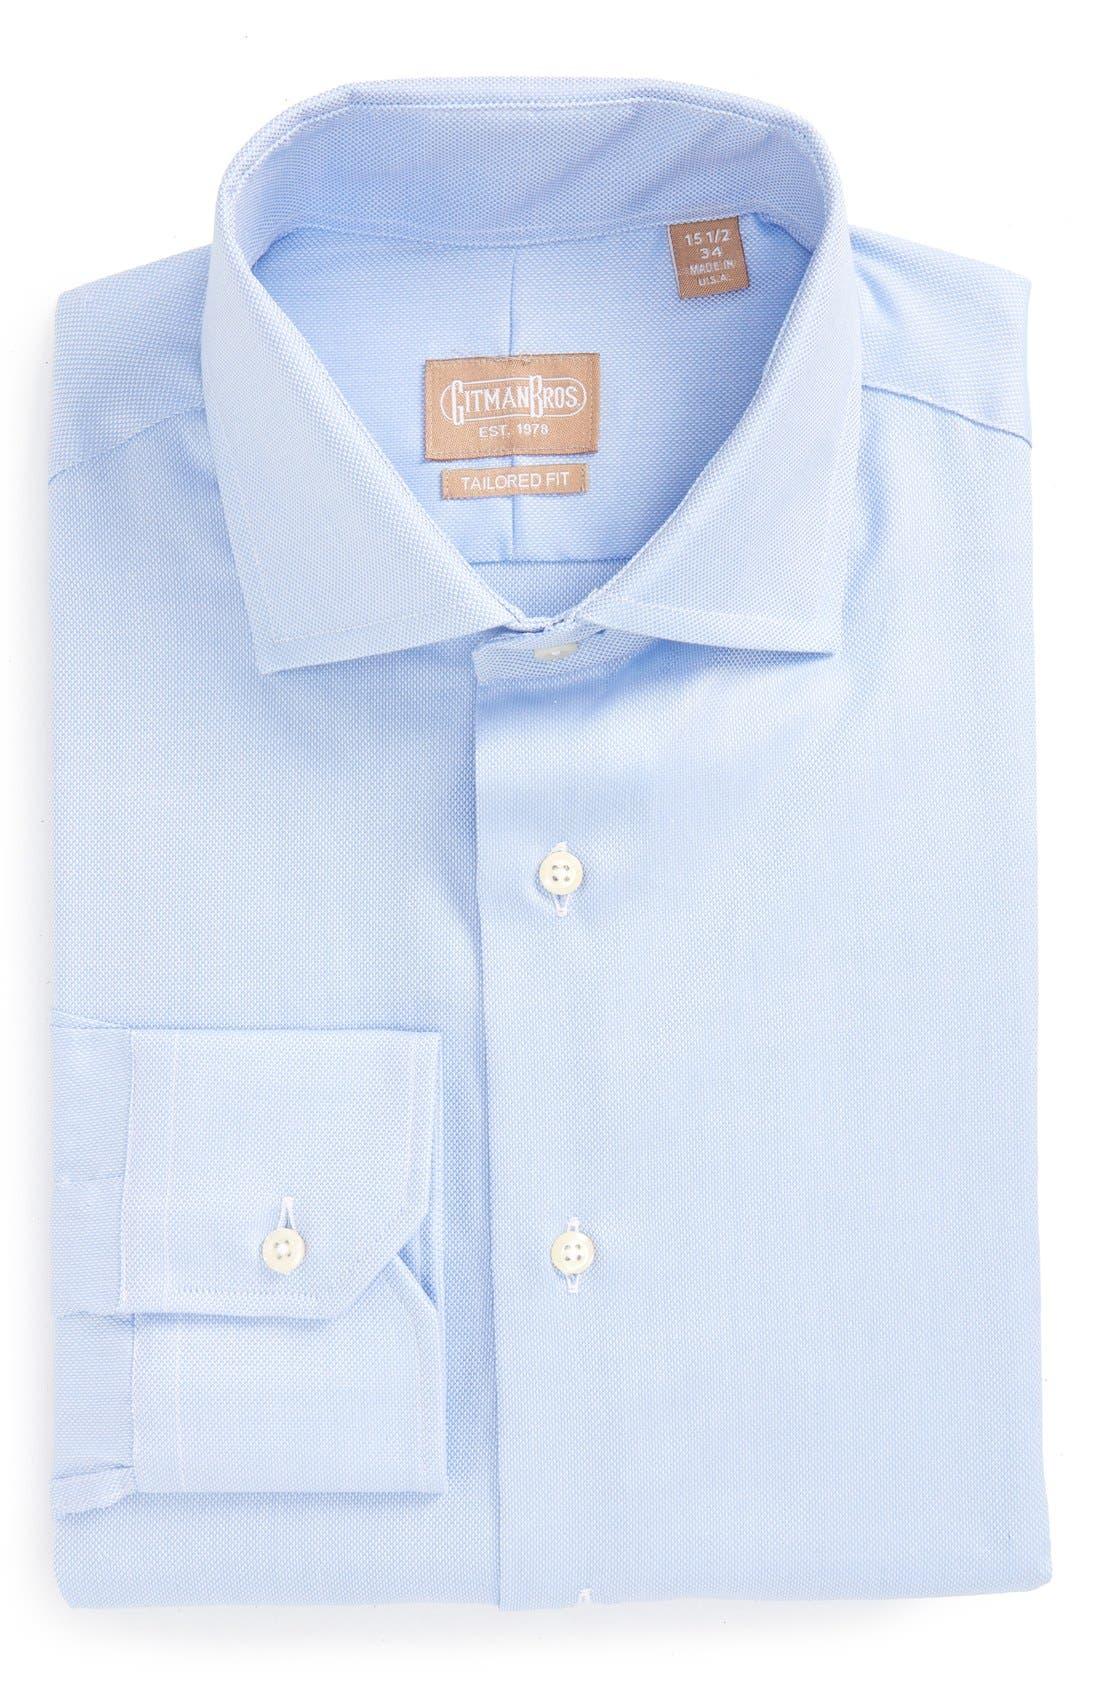 GITMAN, Royal Oxford Tailored Fit Dress Shirt, Main thumbnail 1, color, BLUE